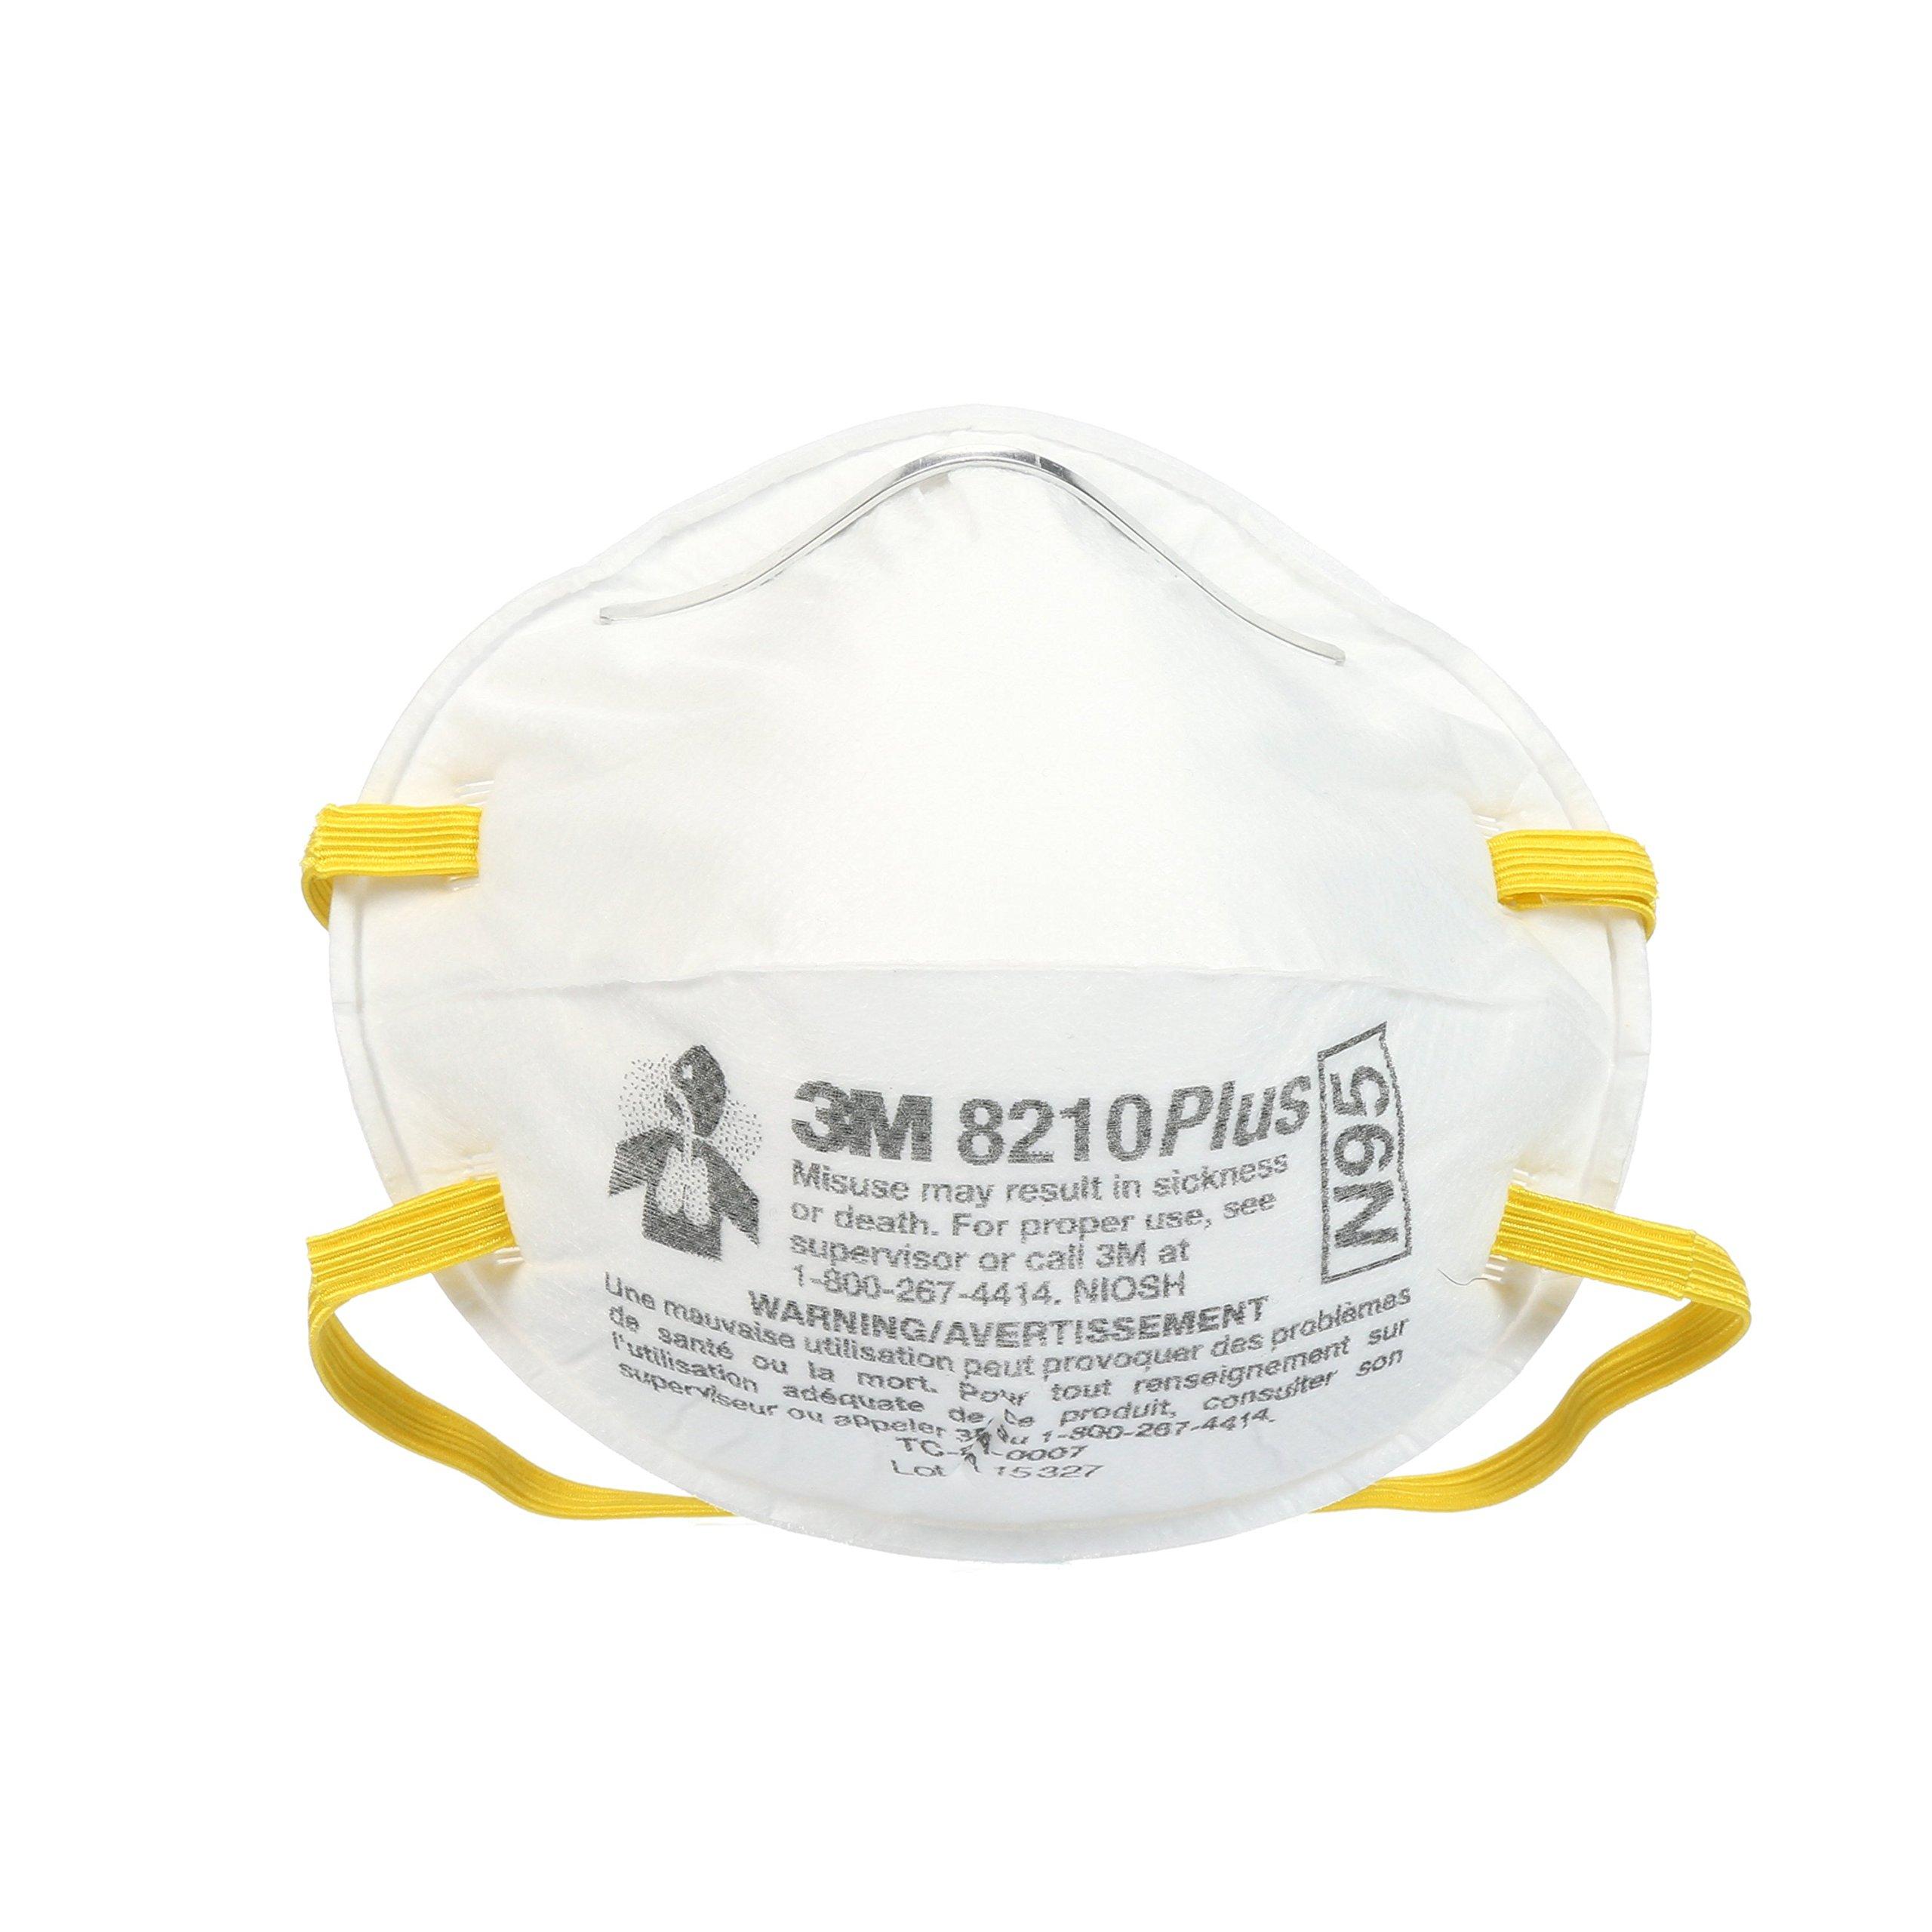 3M 8210 Plus Paint Sanding Dust Particulate Respirators, N95, 20-Pack by 3M (Image #2)